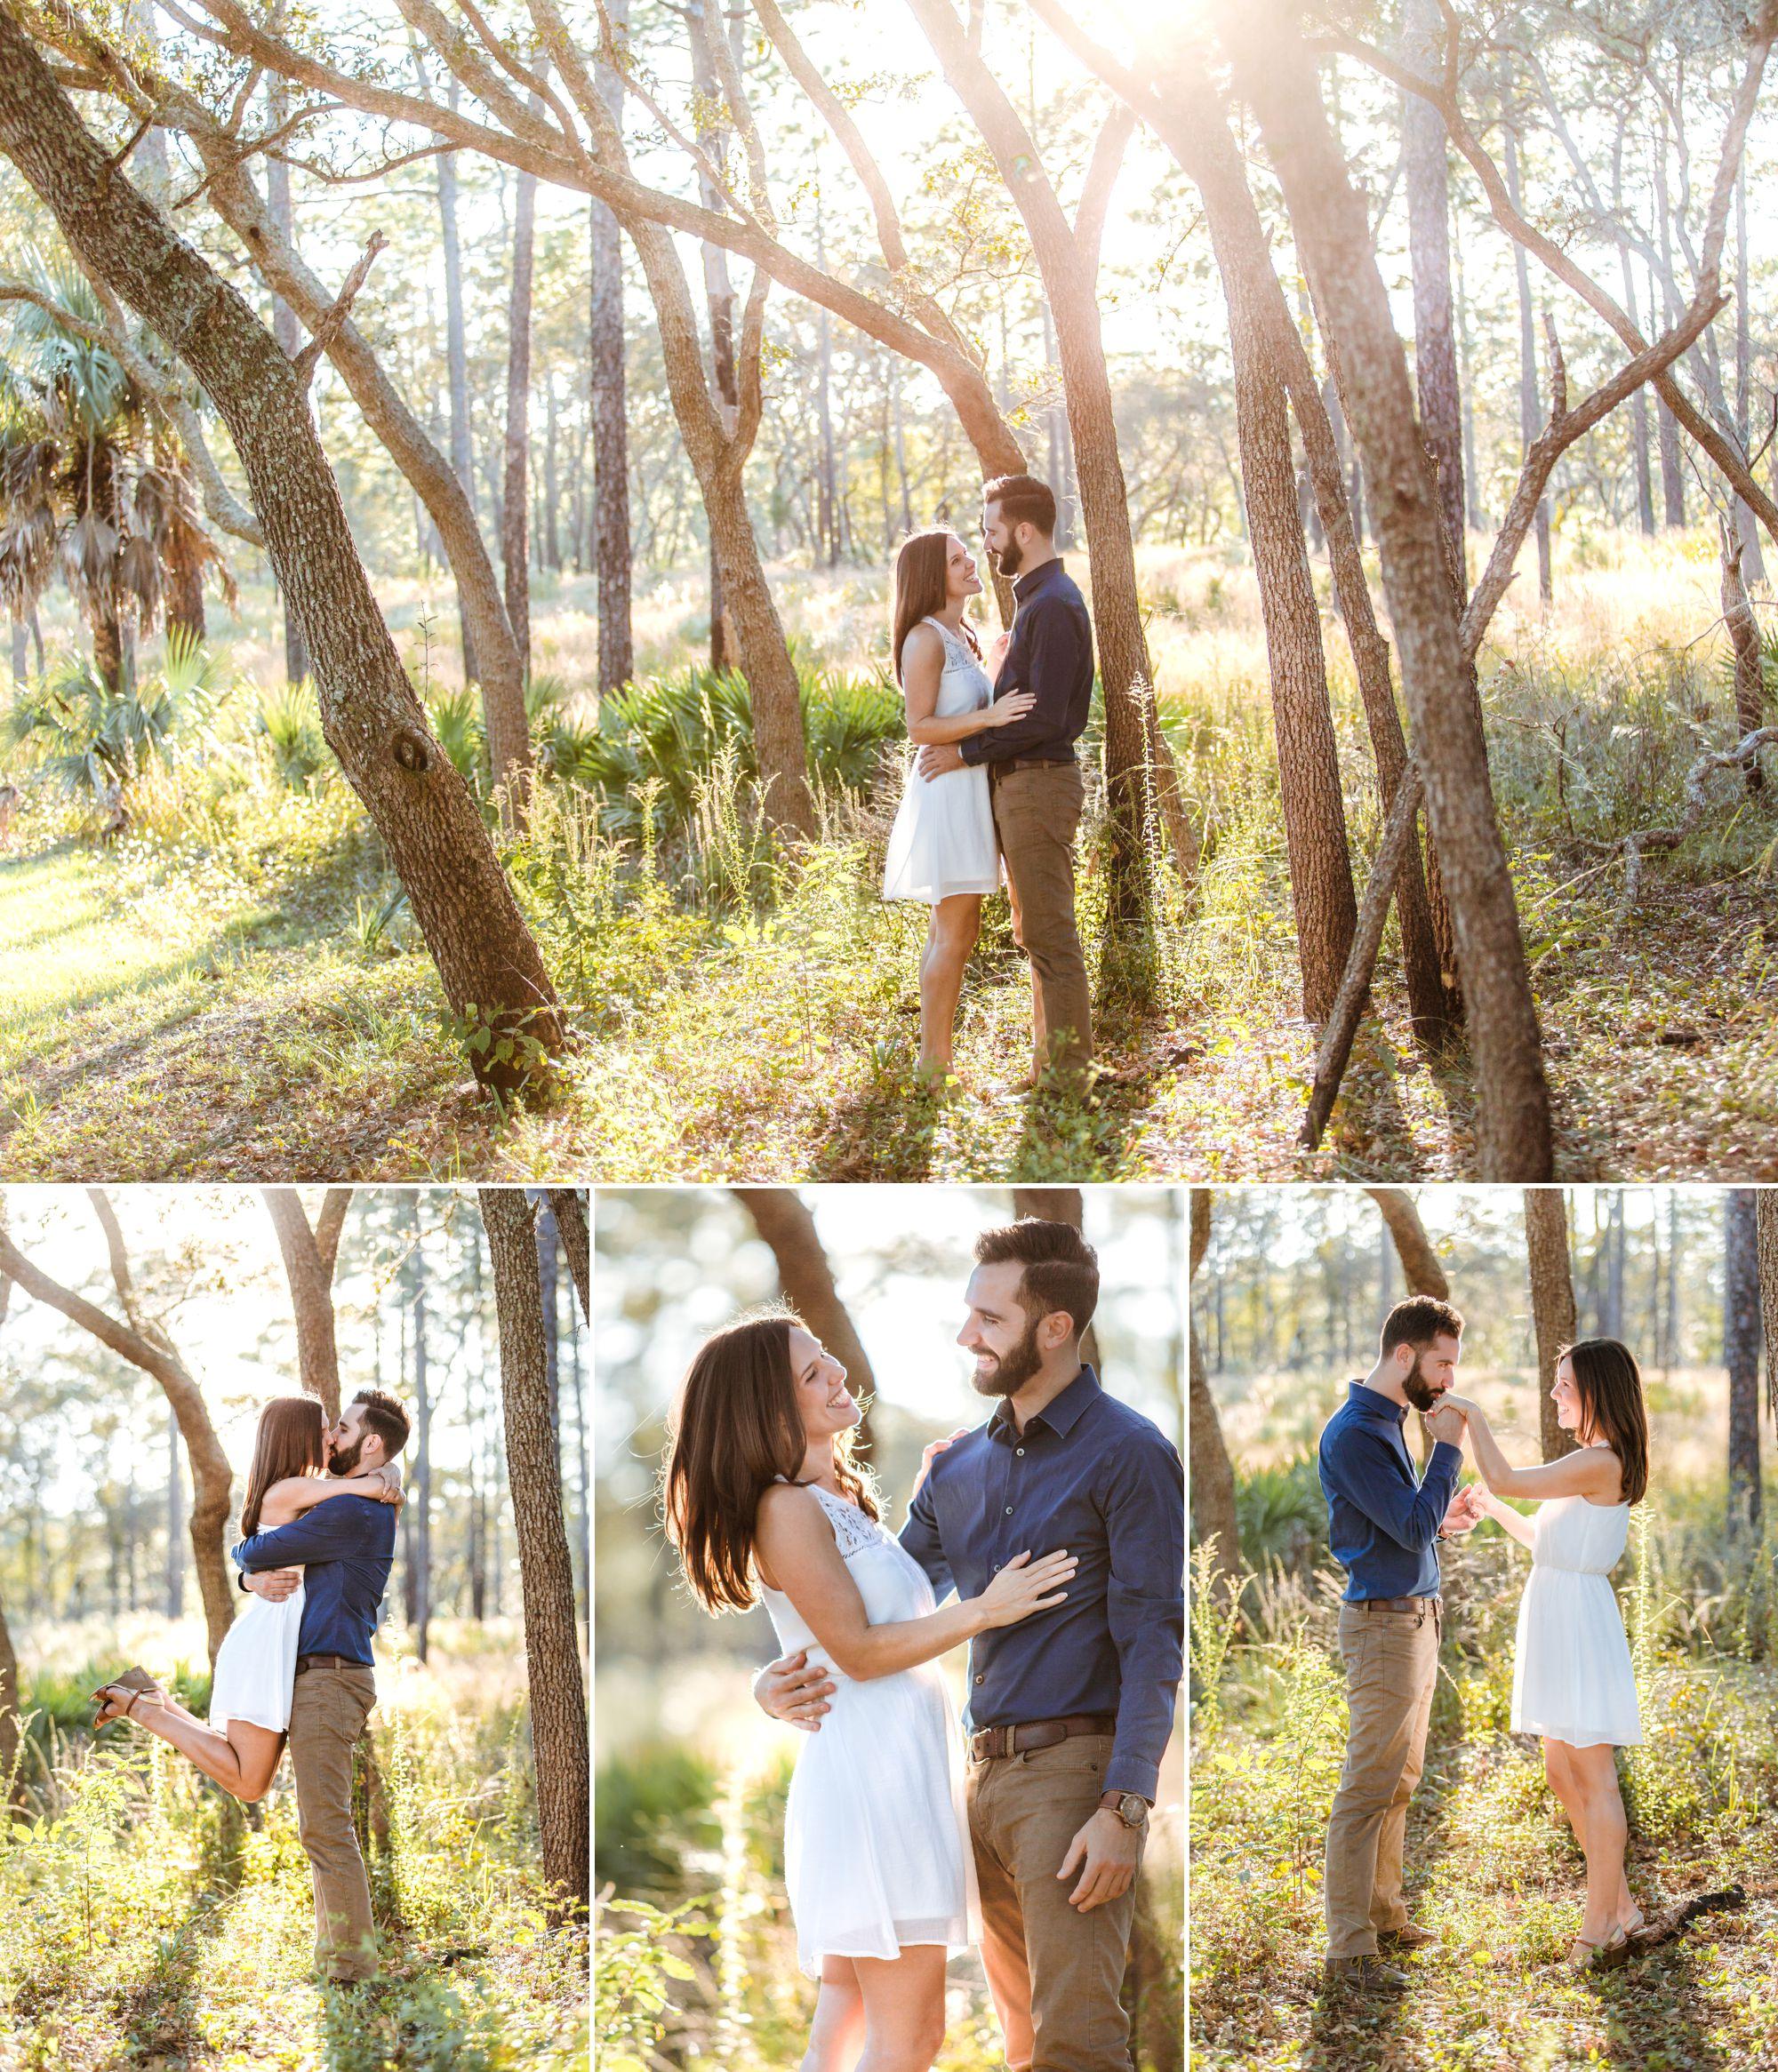 Magical sunset engagement photos at Wekiva Springs State Park in Orlando, Florida | Shainadeciryan.com